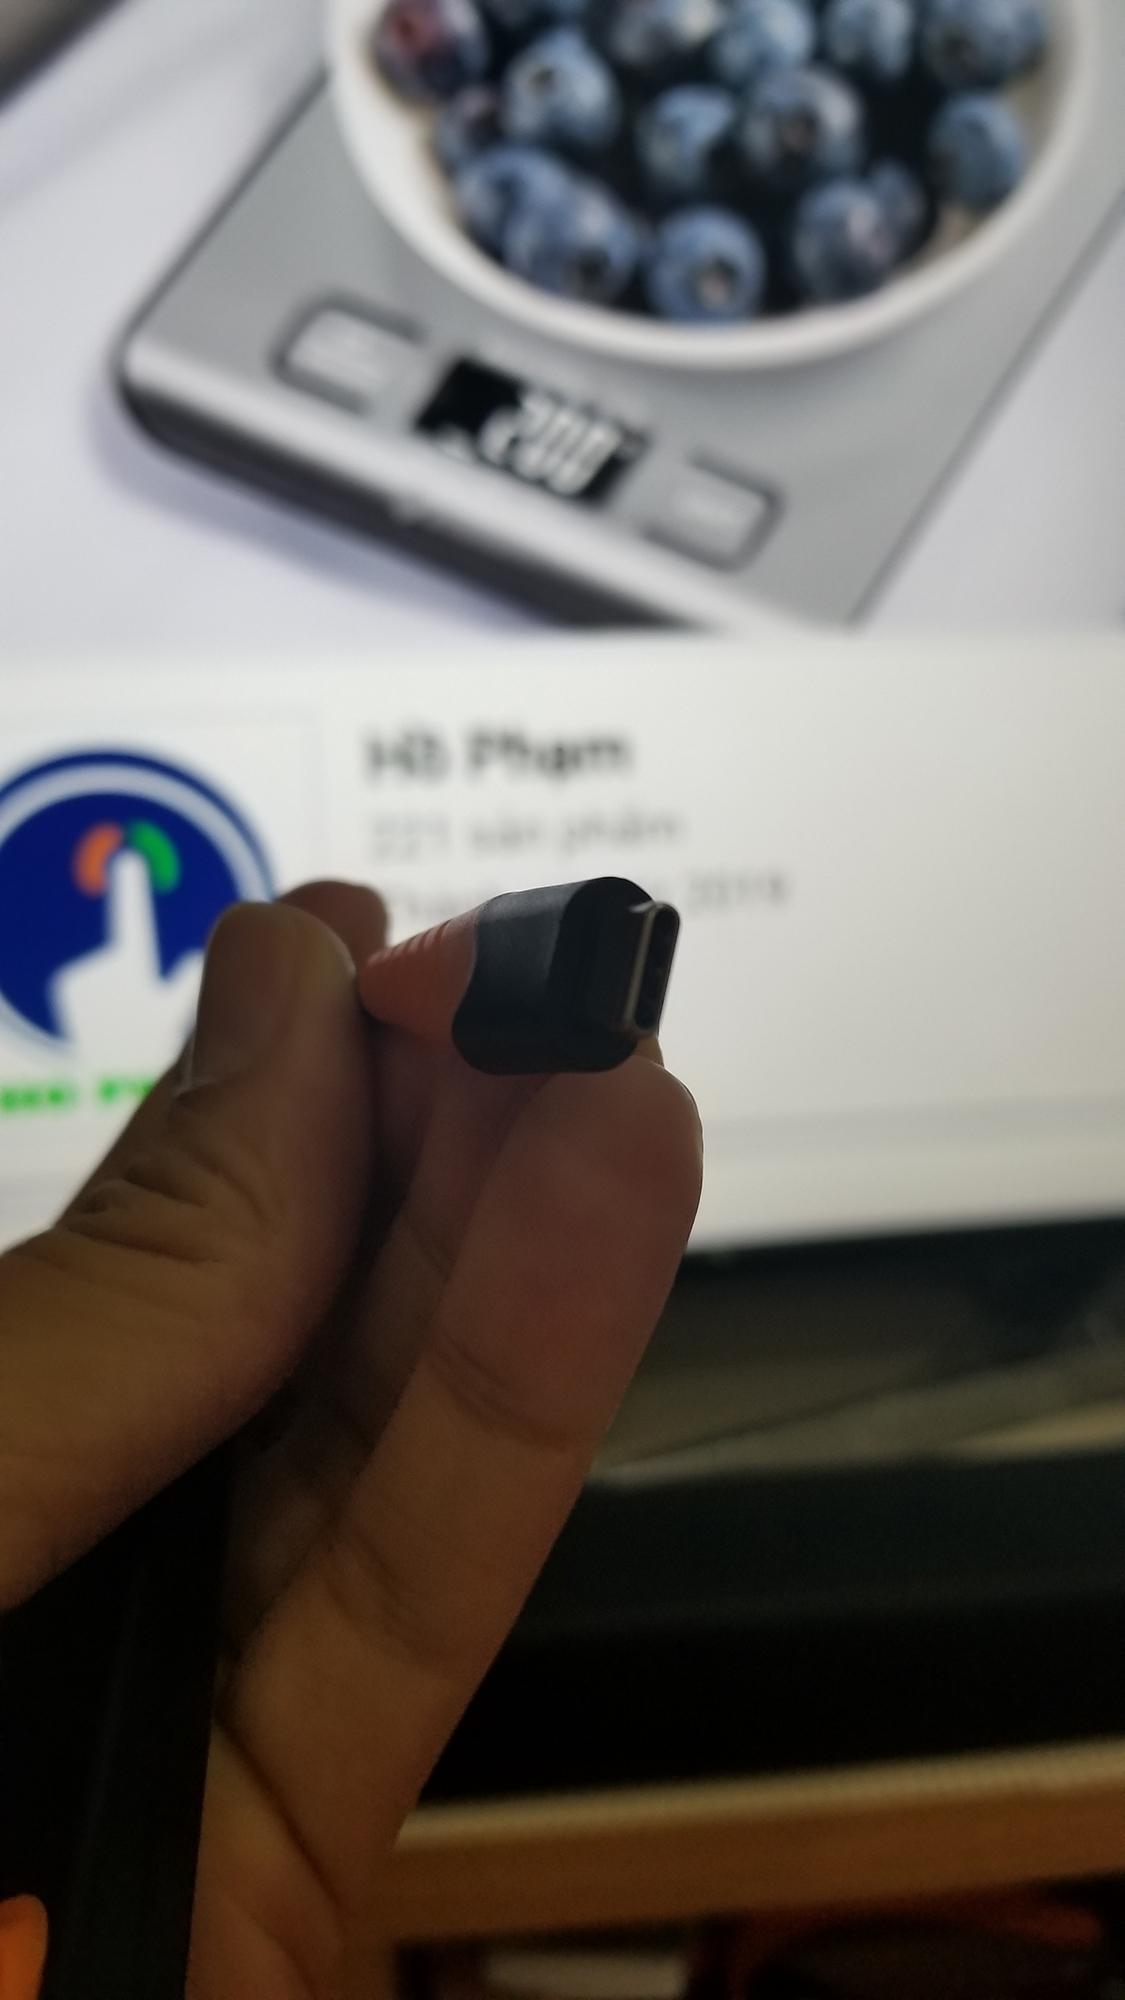 Cáp chuyển USB Type-C ra RJ45/ Ethernet tốc độ 1000Mbps